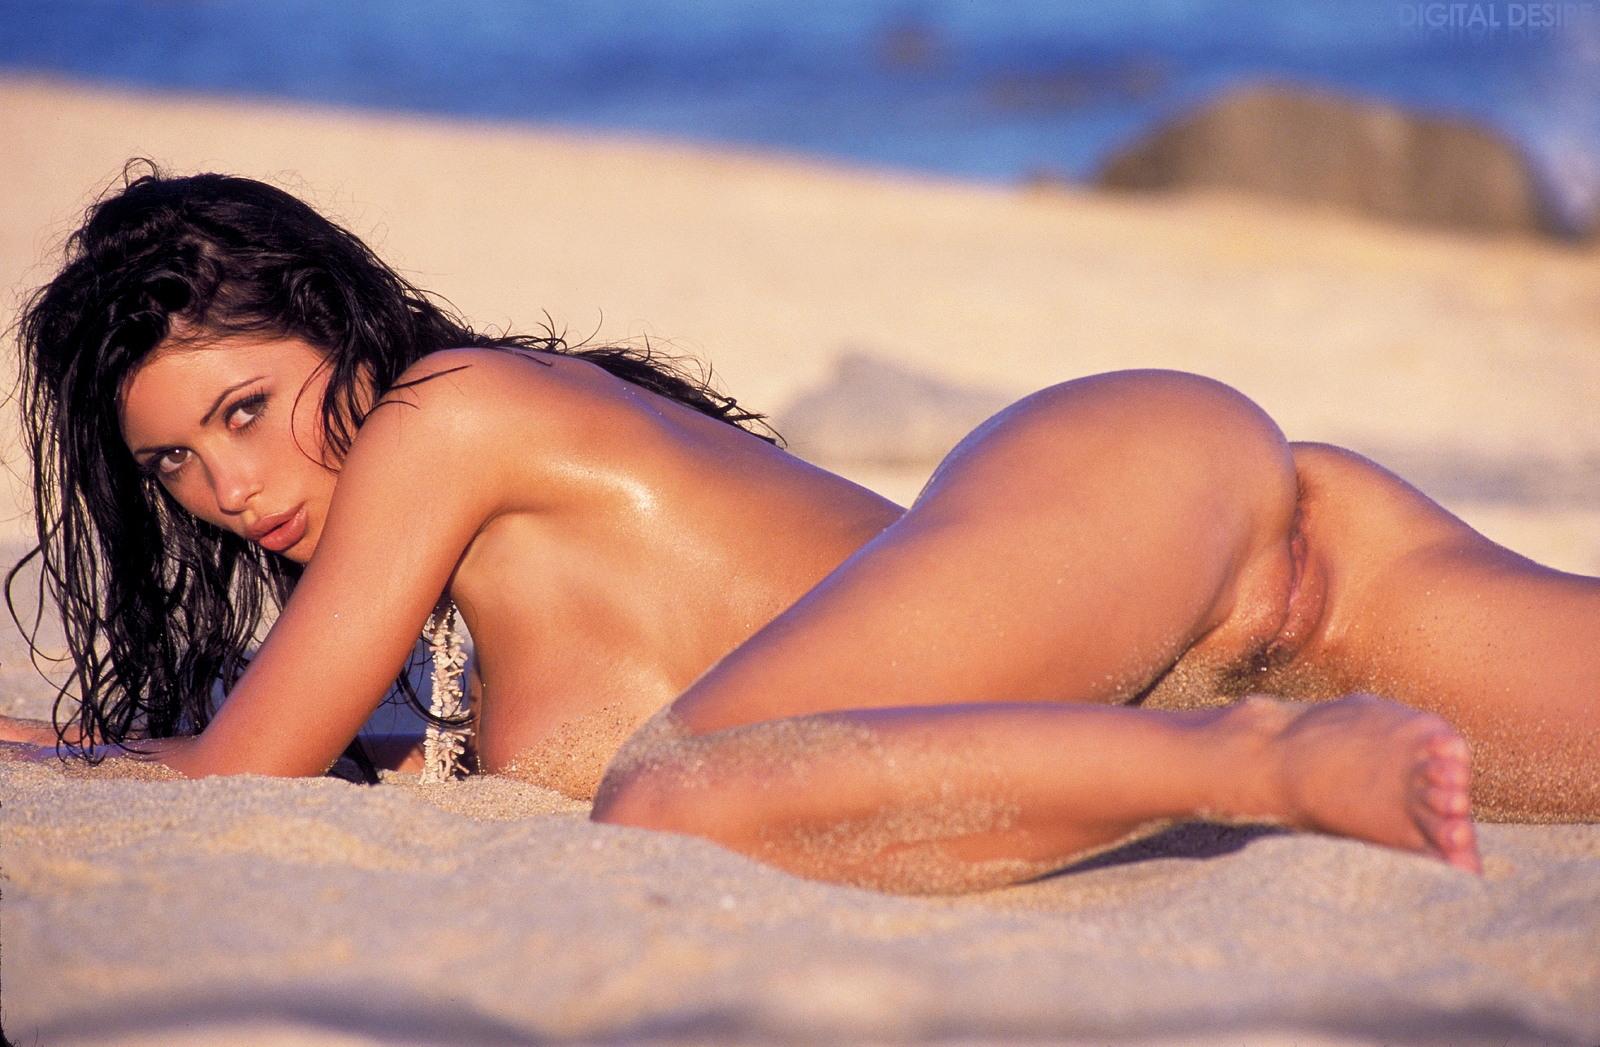 ai t stephens miss venezuela nude   hot naked babes